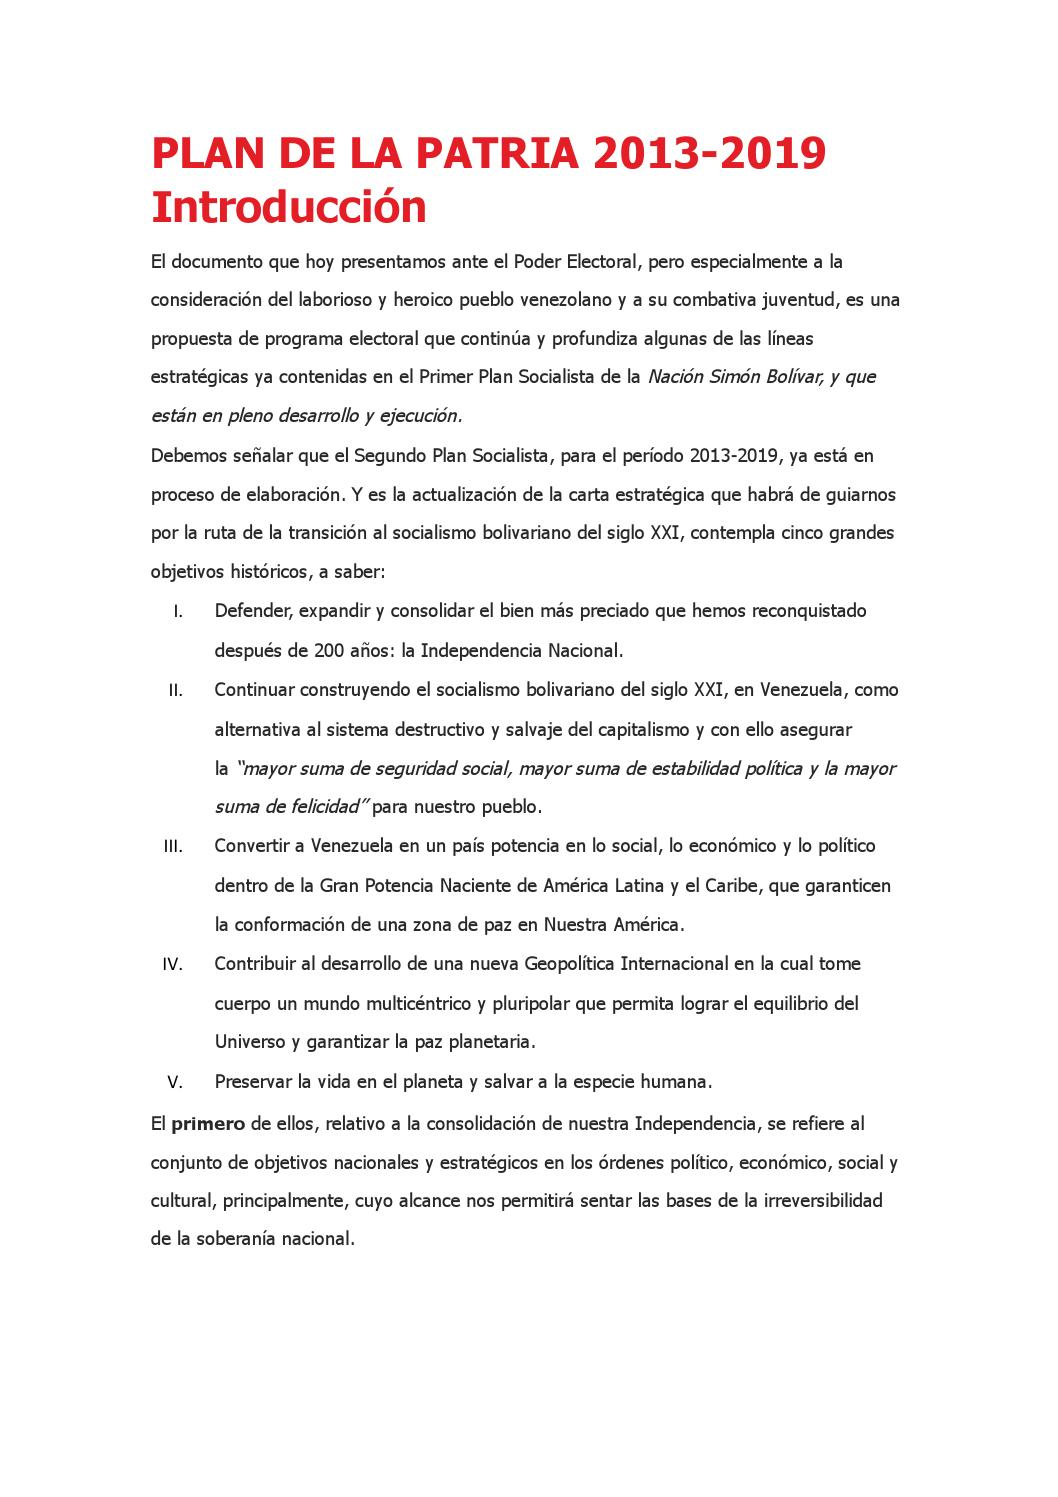 Plan de la patria 2013 by robert castillo - issuu